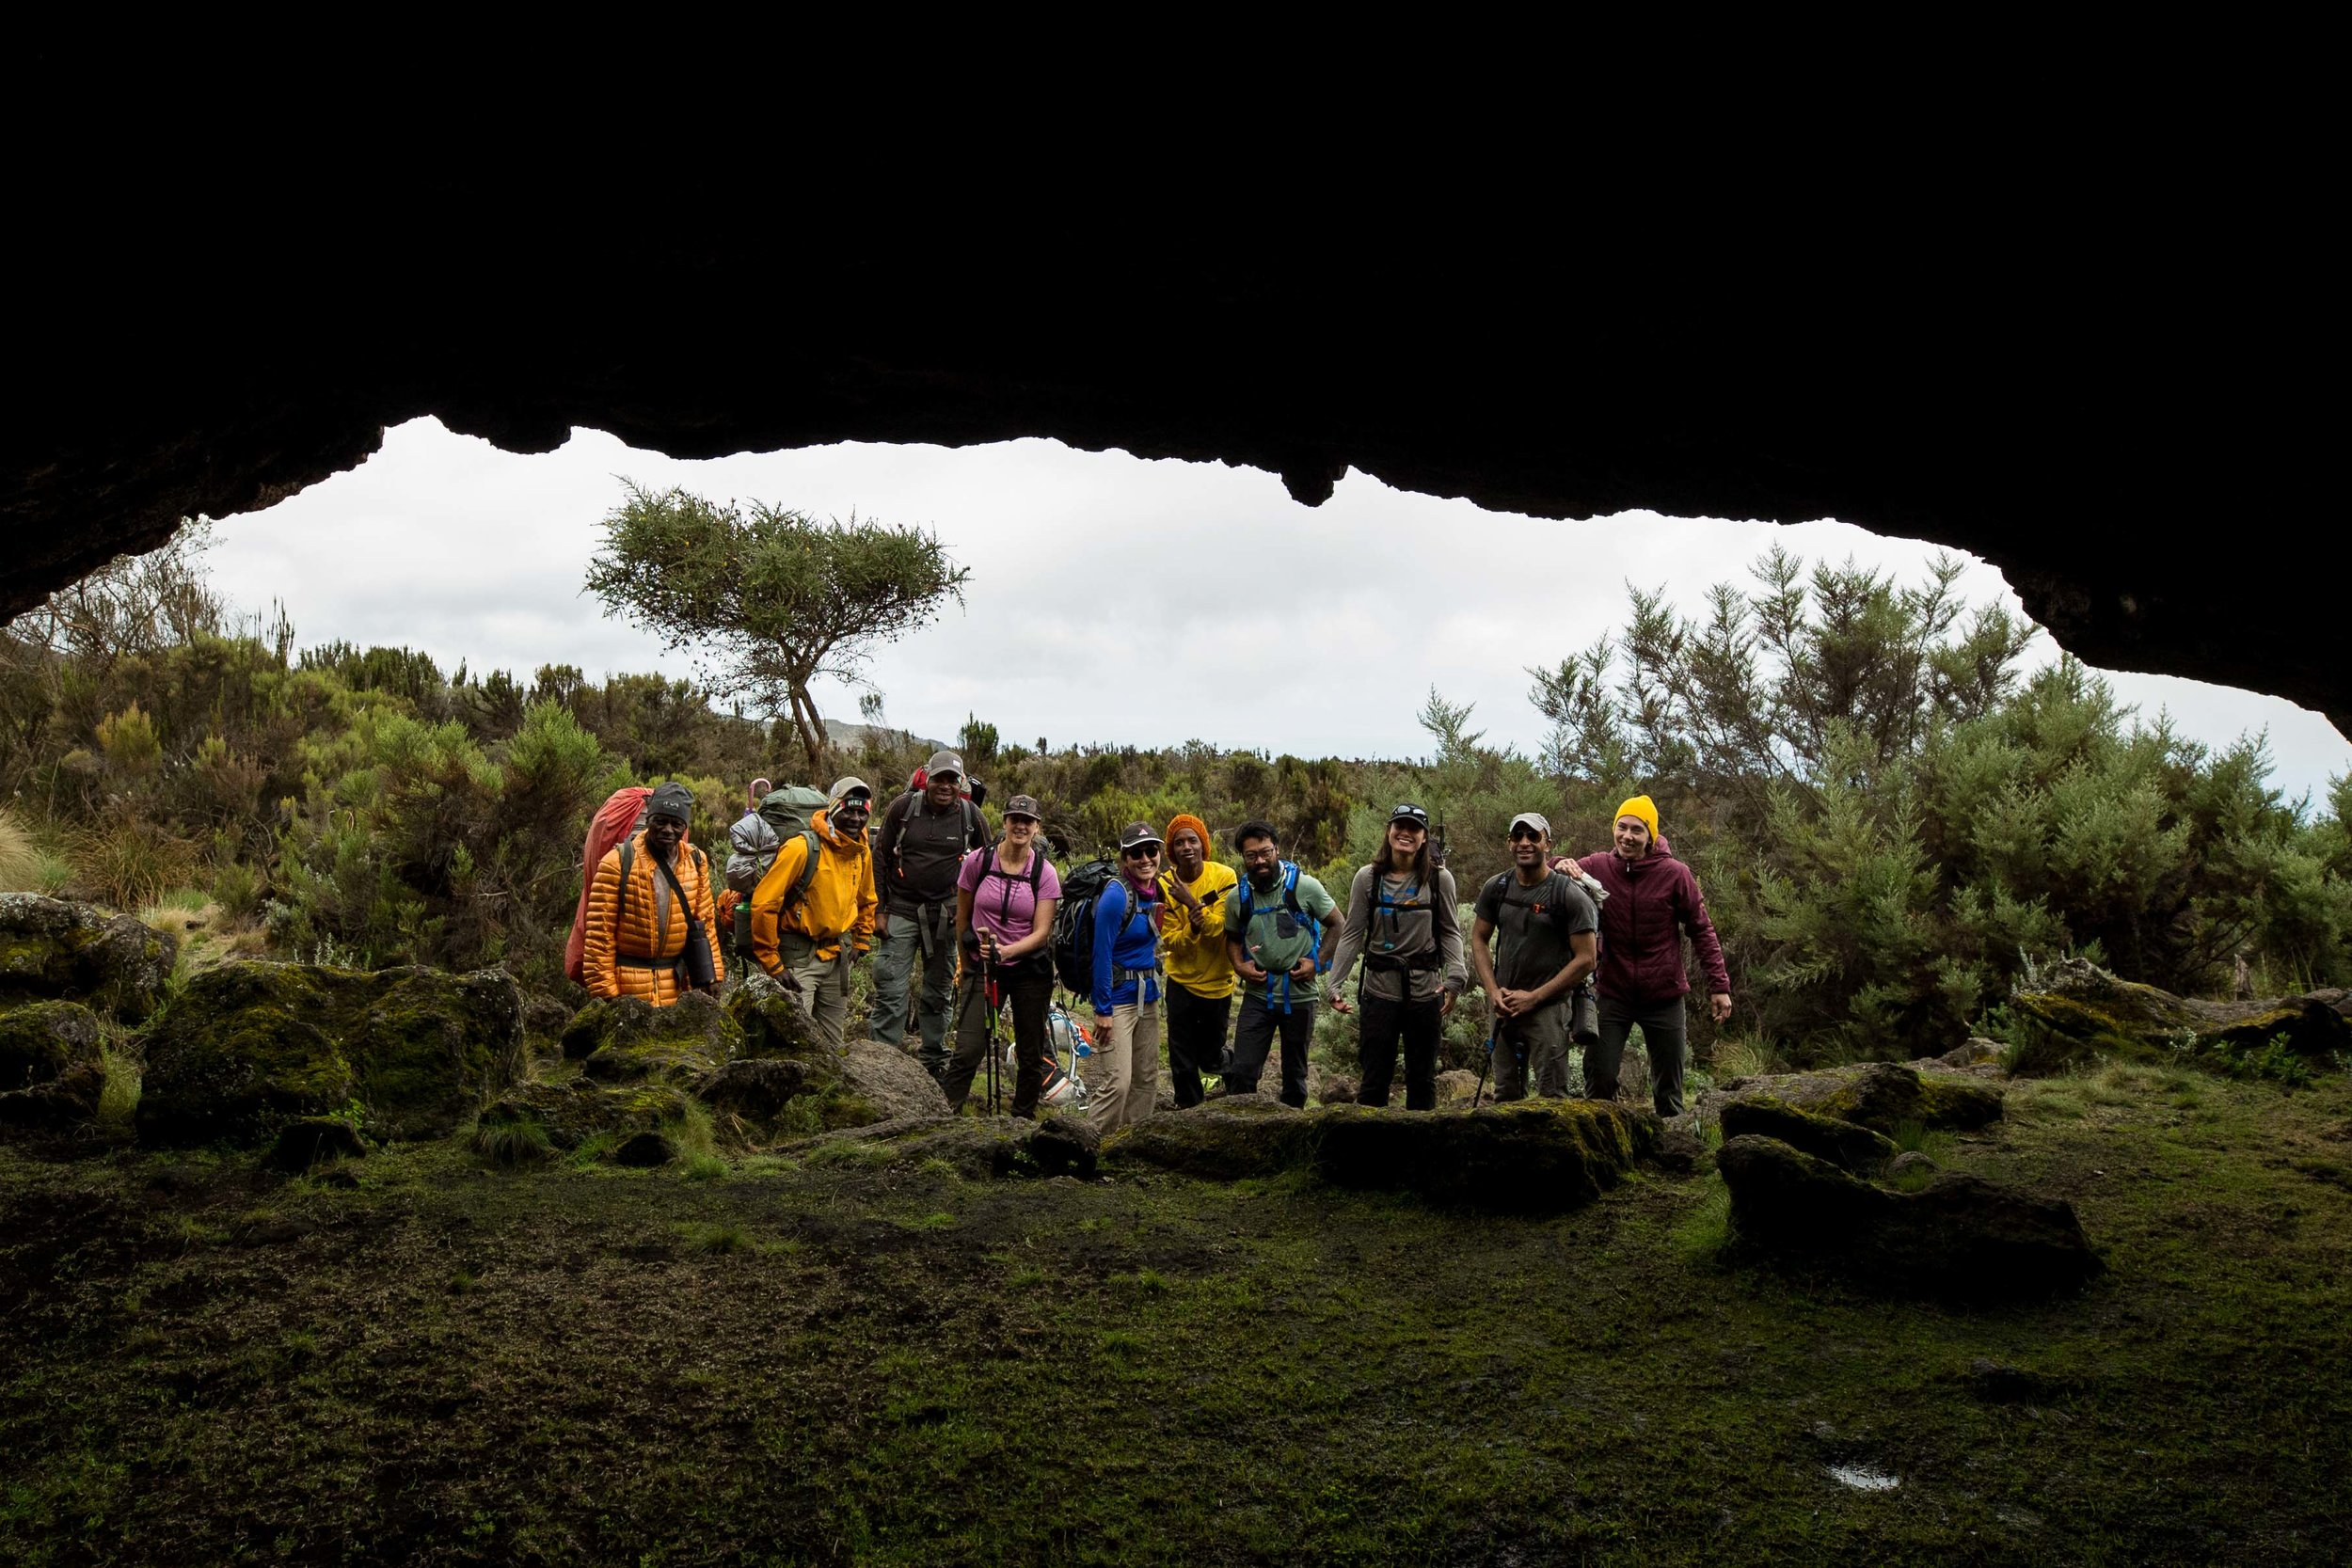 ajw_REI_Kilimanjaro-13.jpg